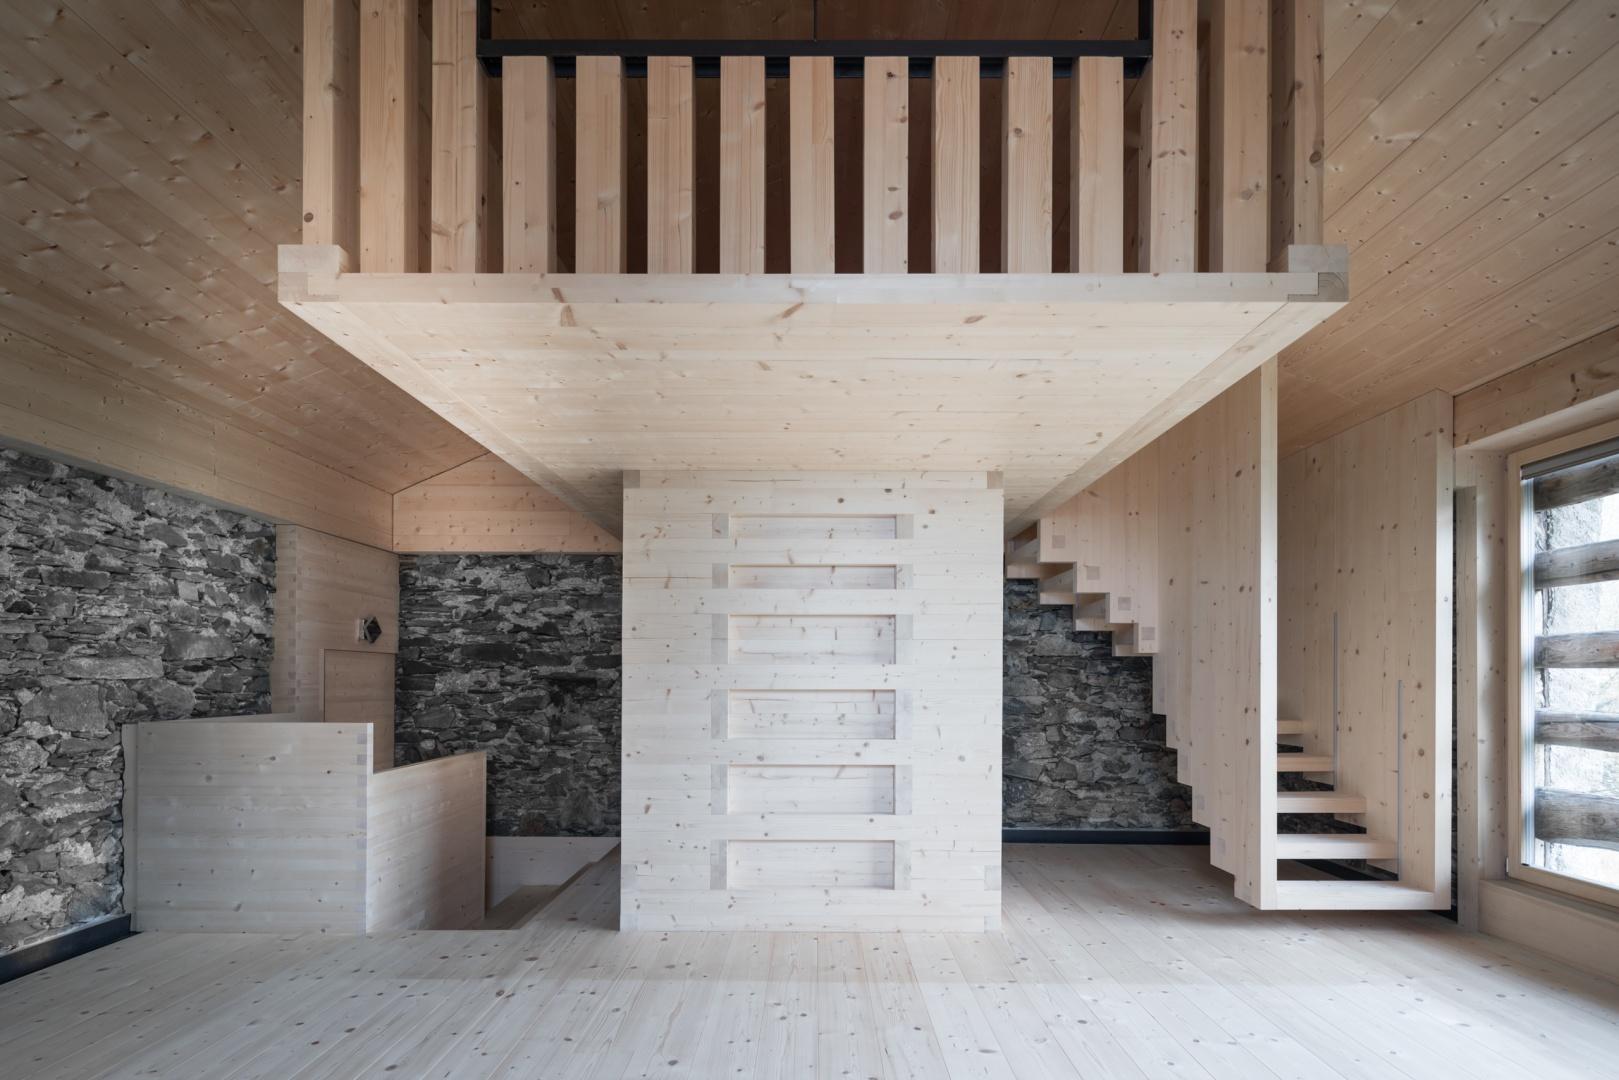 CCC_Wohnraum © Sandra Cortesi Architektin